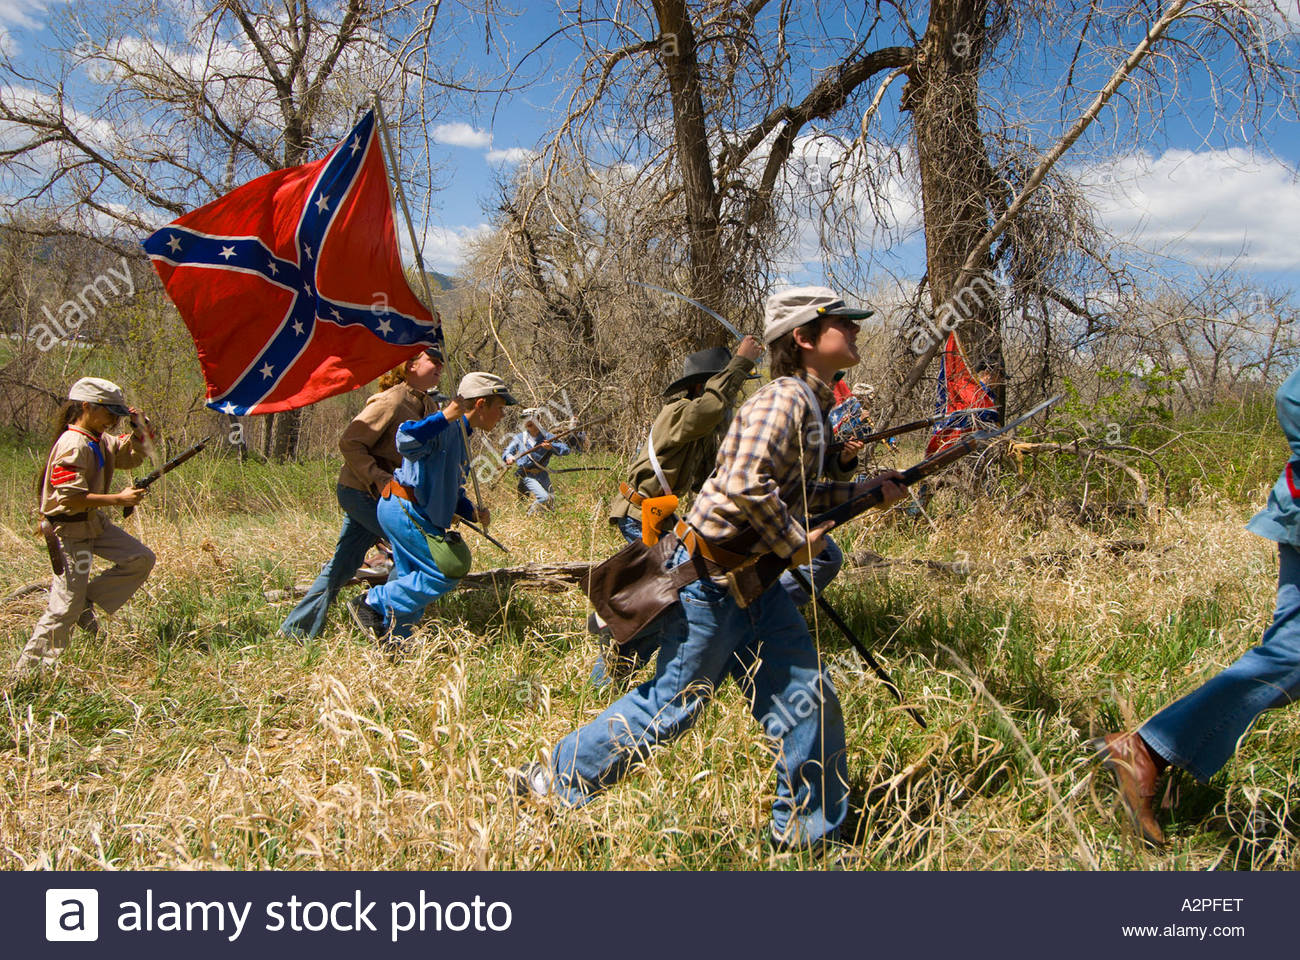 Civil War Battle Reenactment By Children From Wilder